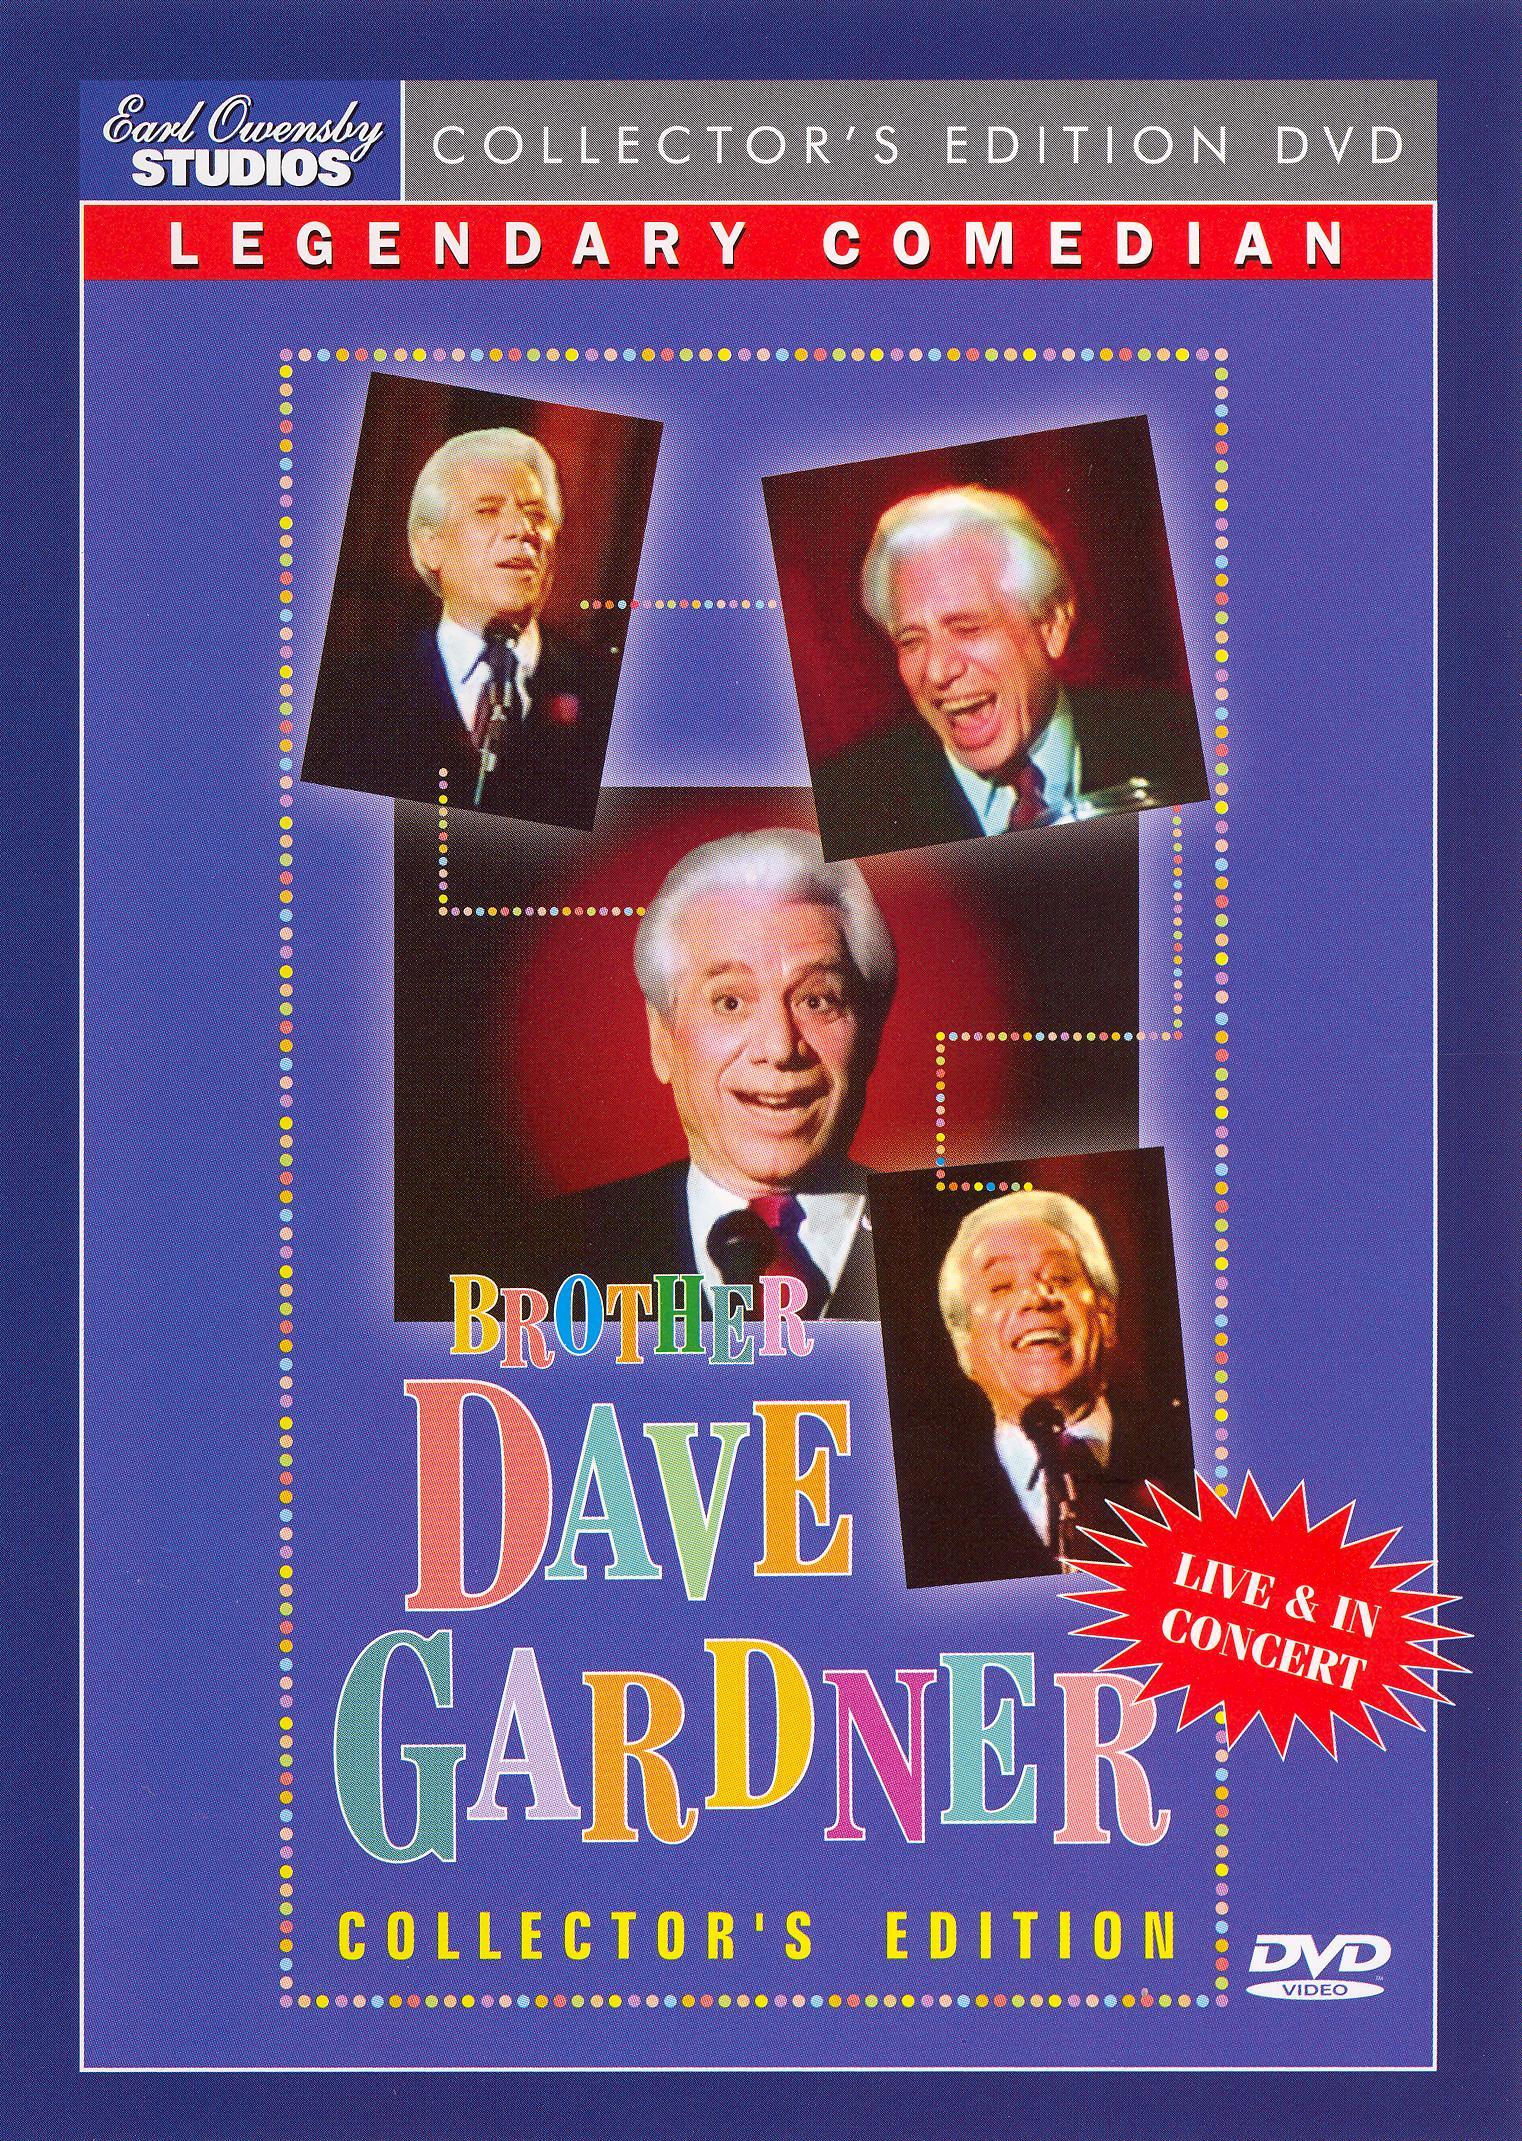 Dave Gardner: Collector's Edition